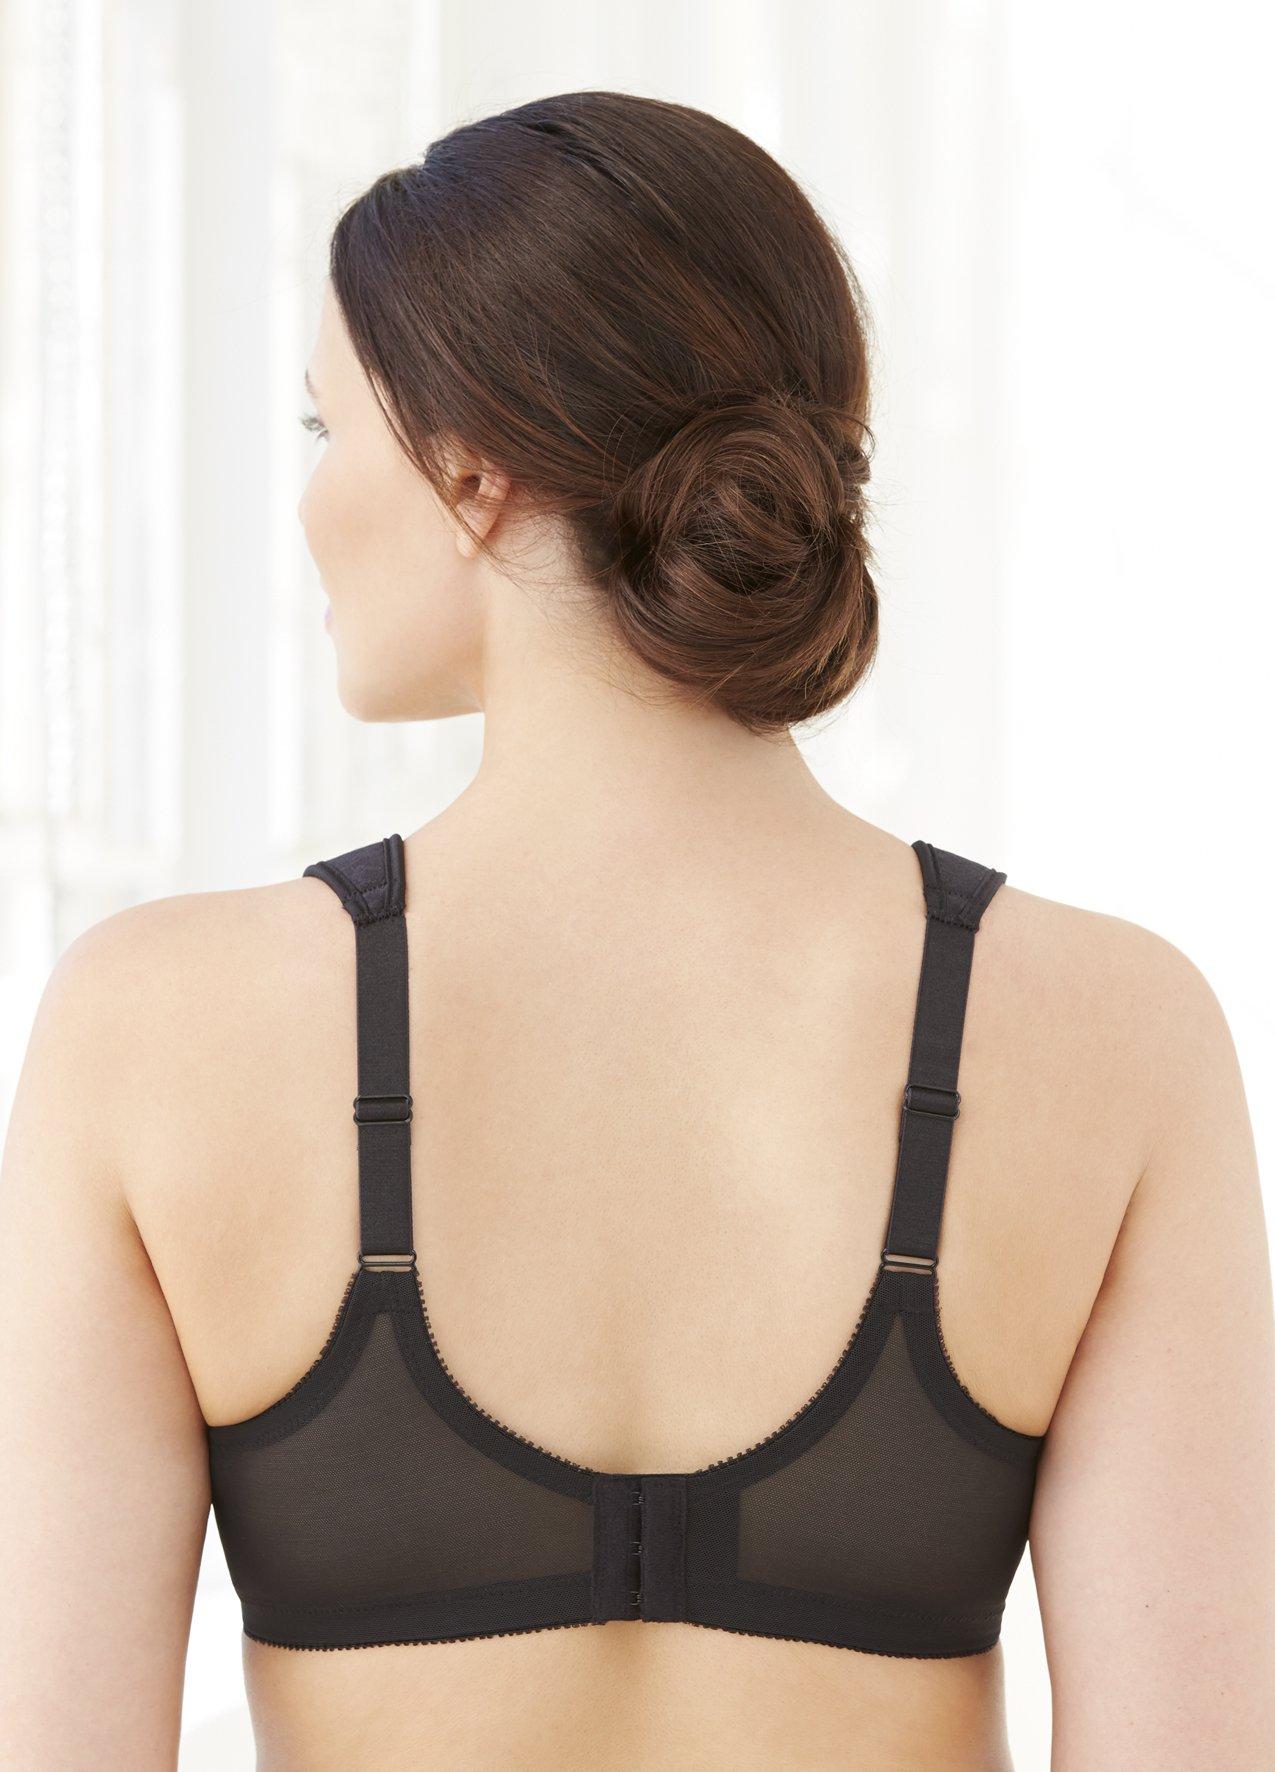 Glamorise Women's Plus-Size Full-Figure Sports Bra 1006, Pink, 34G by Glamorise (Image #3)